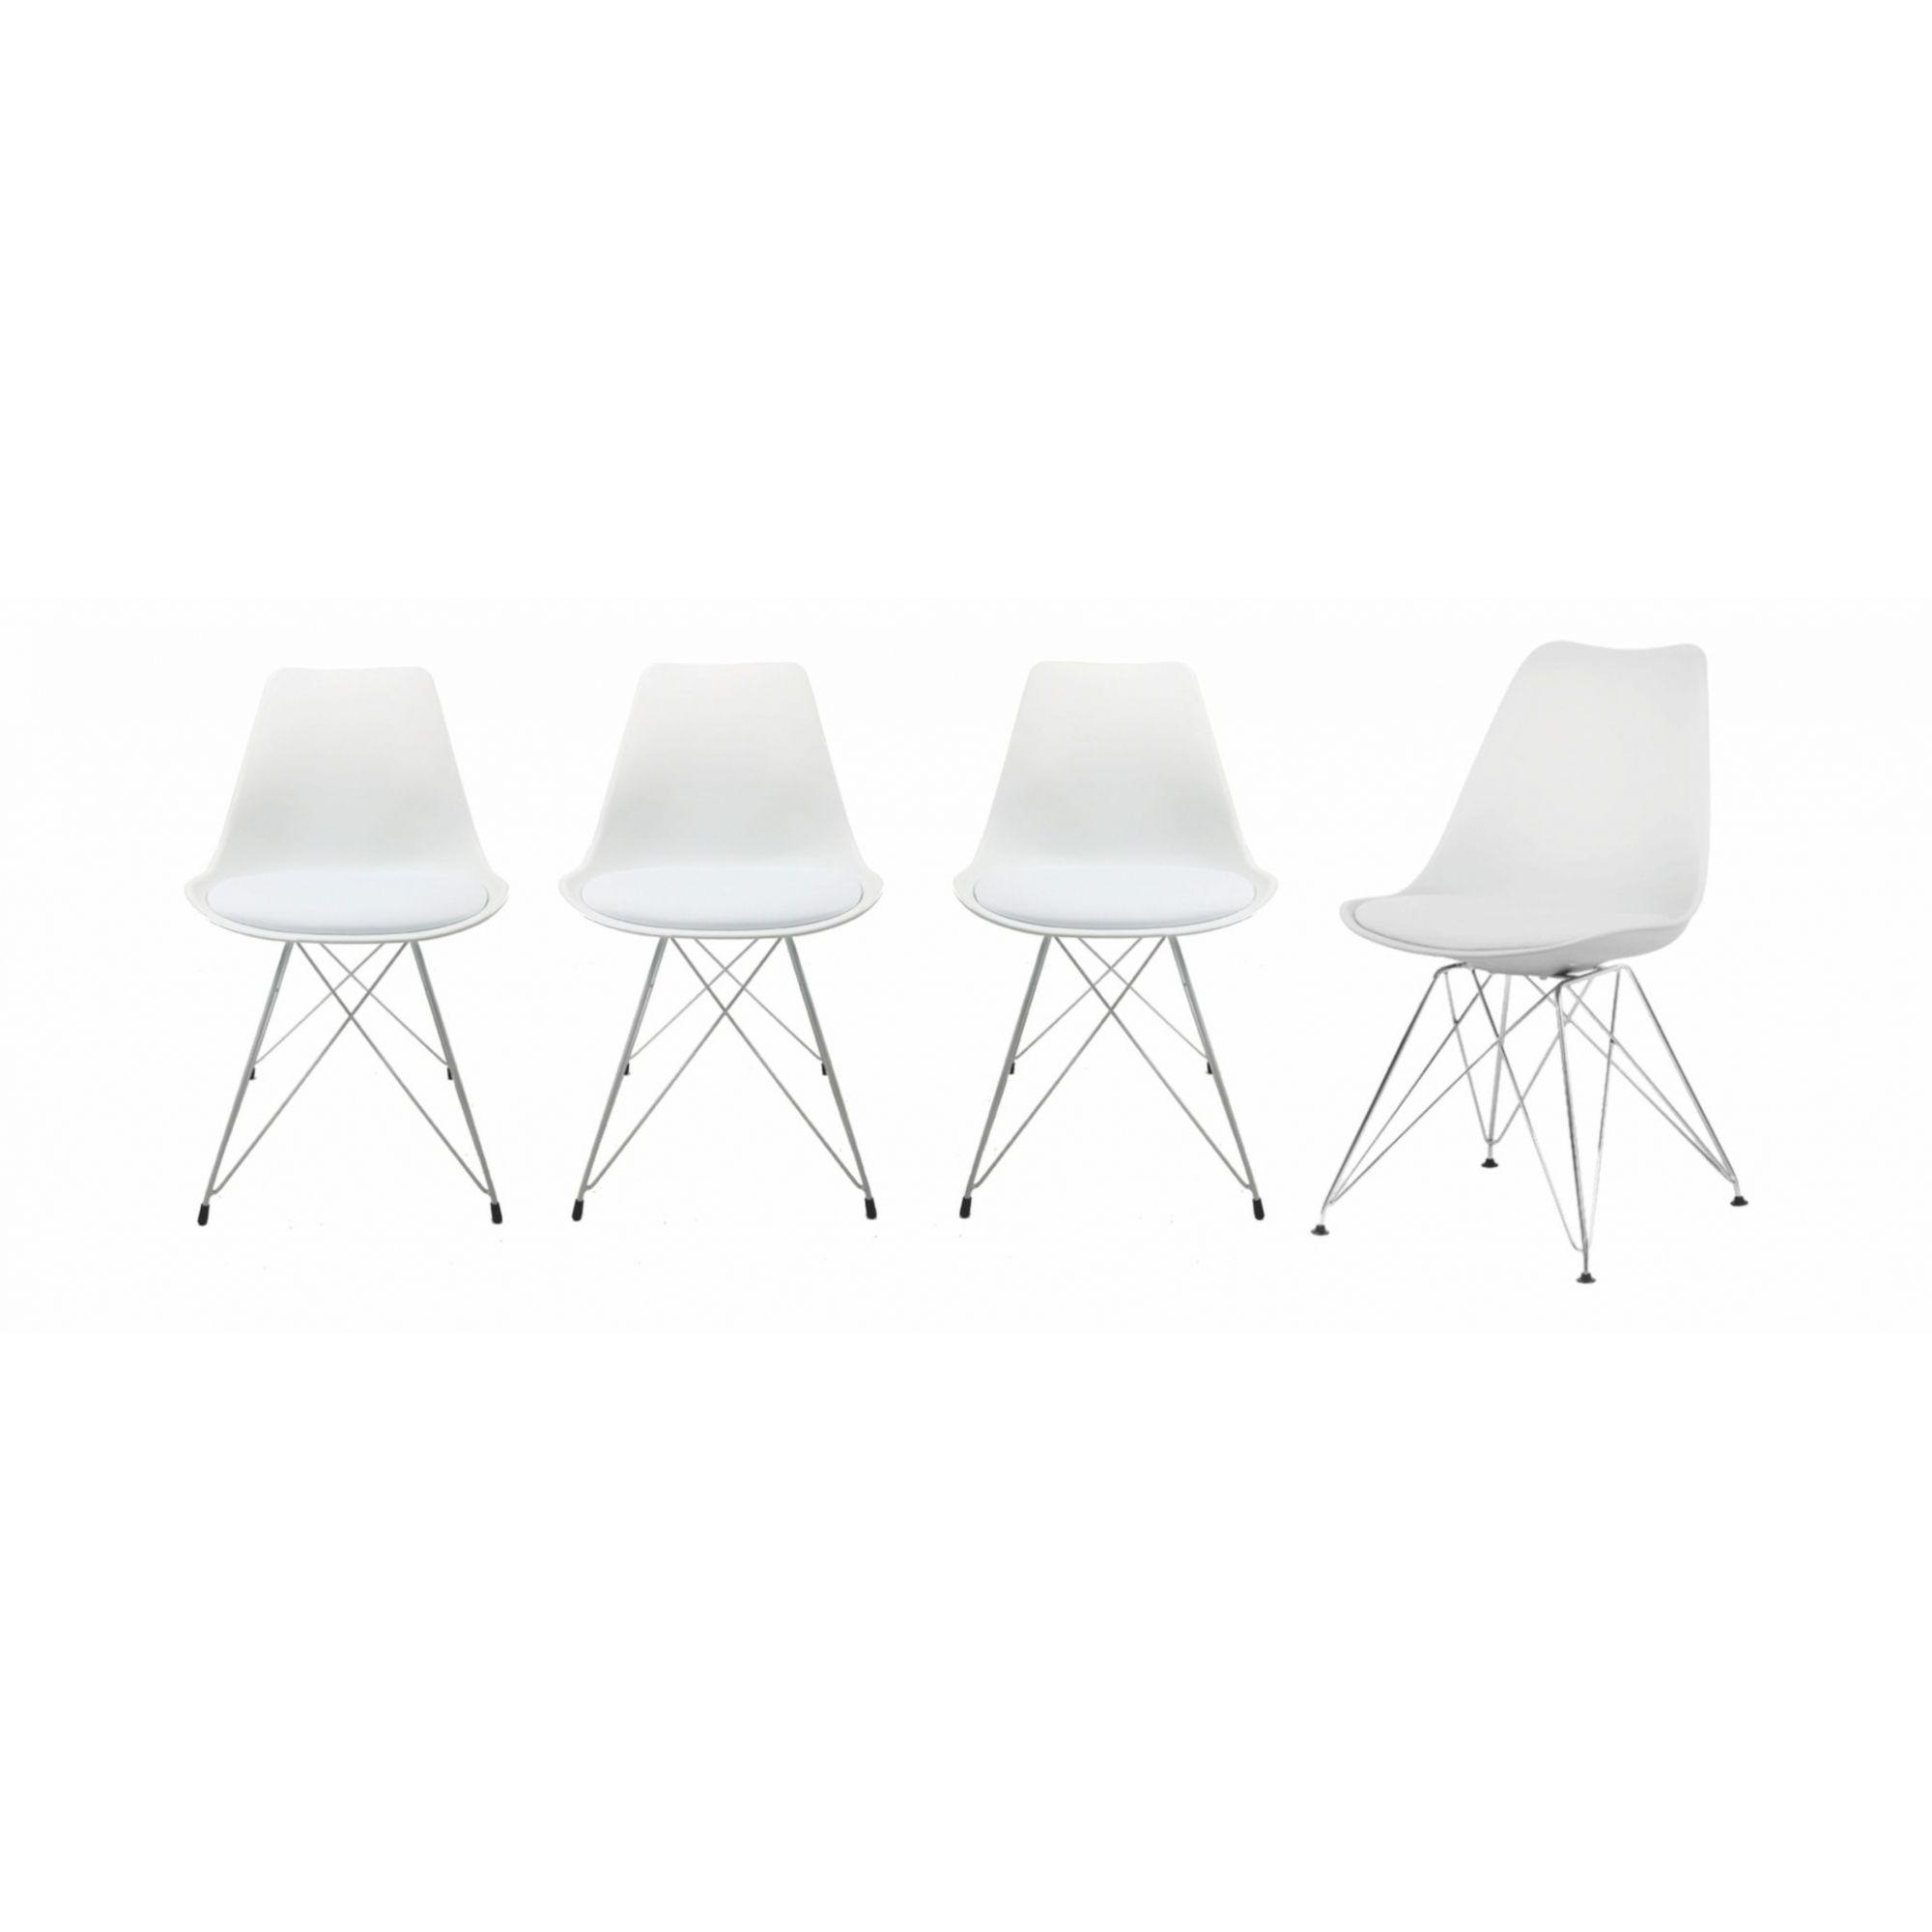 Kit com 4 Cadeiras Charles Eames Eiffel Branca Base Metal Pelegrin Pw-075